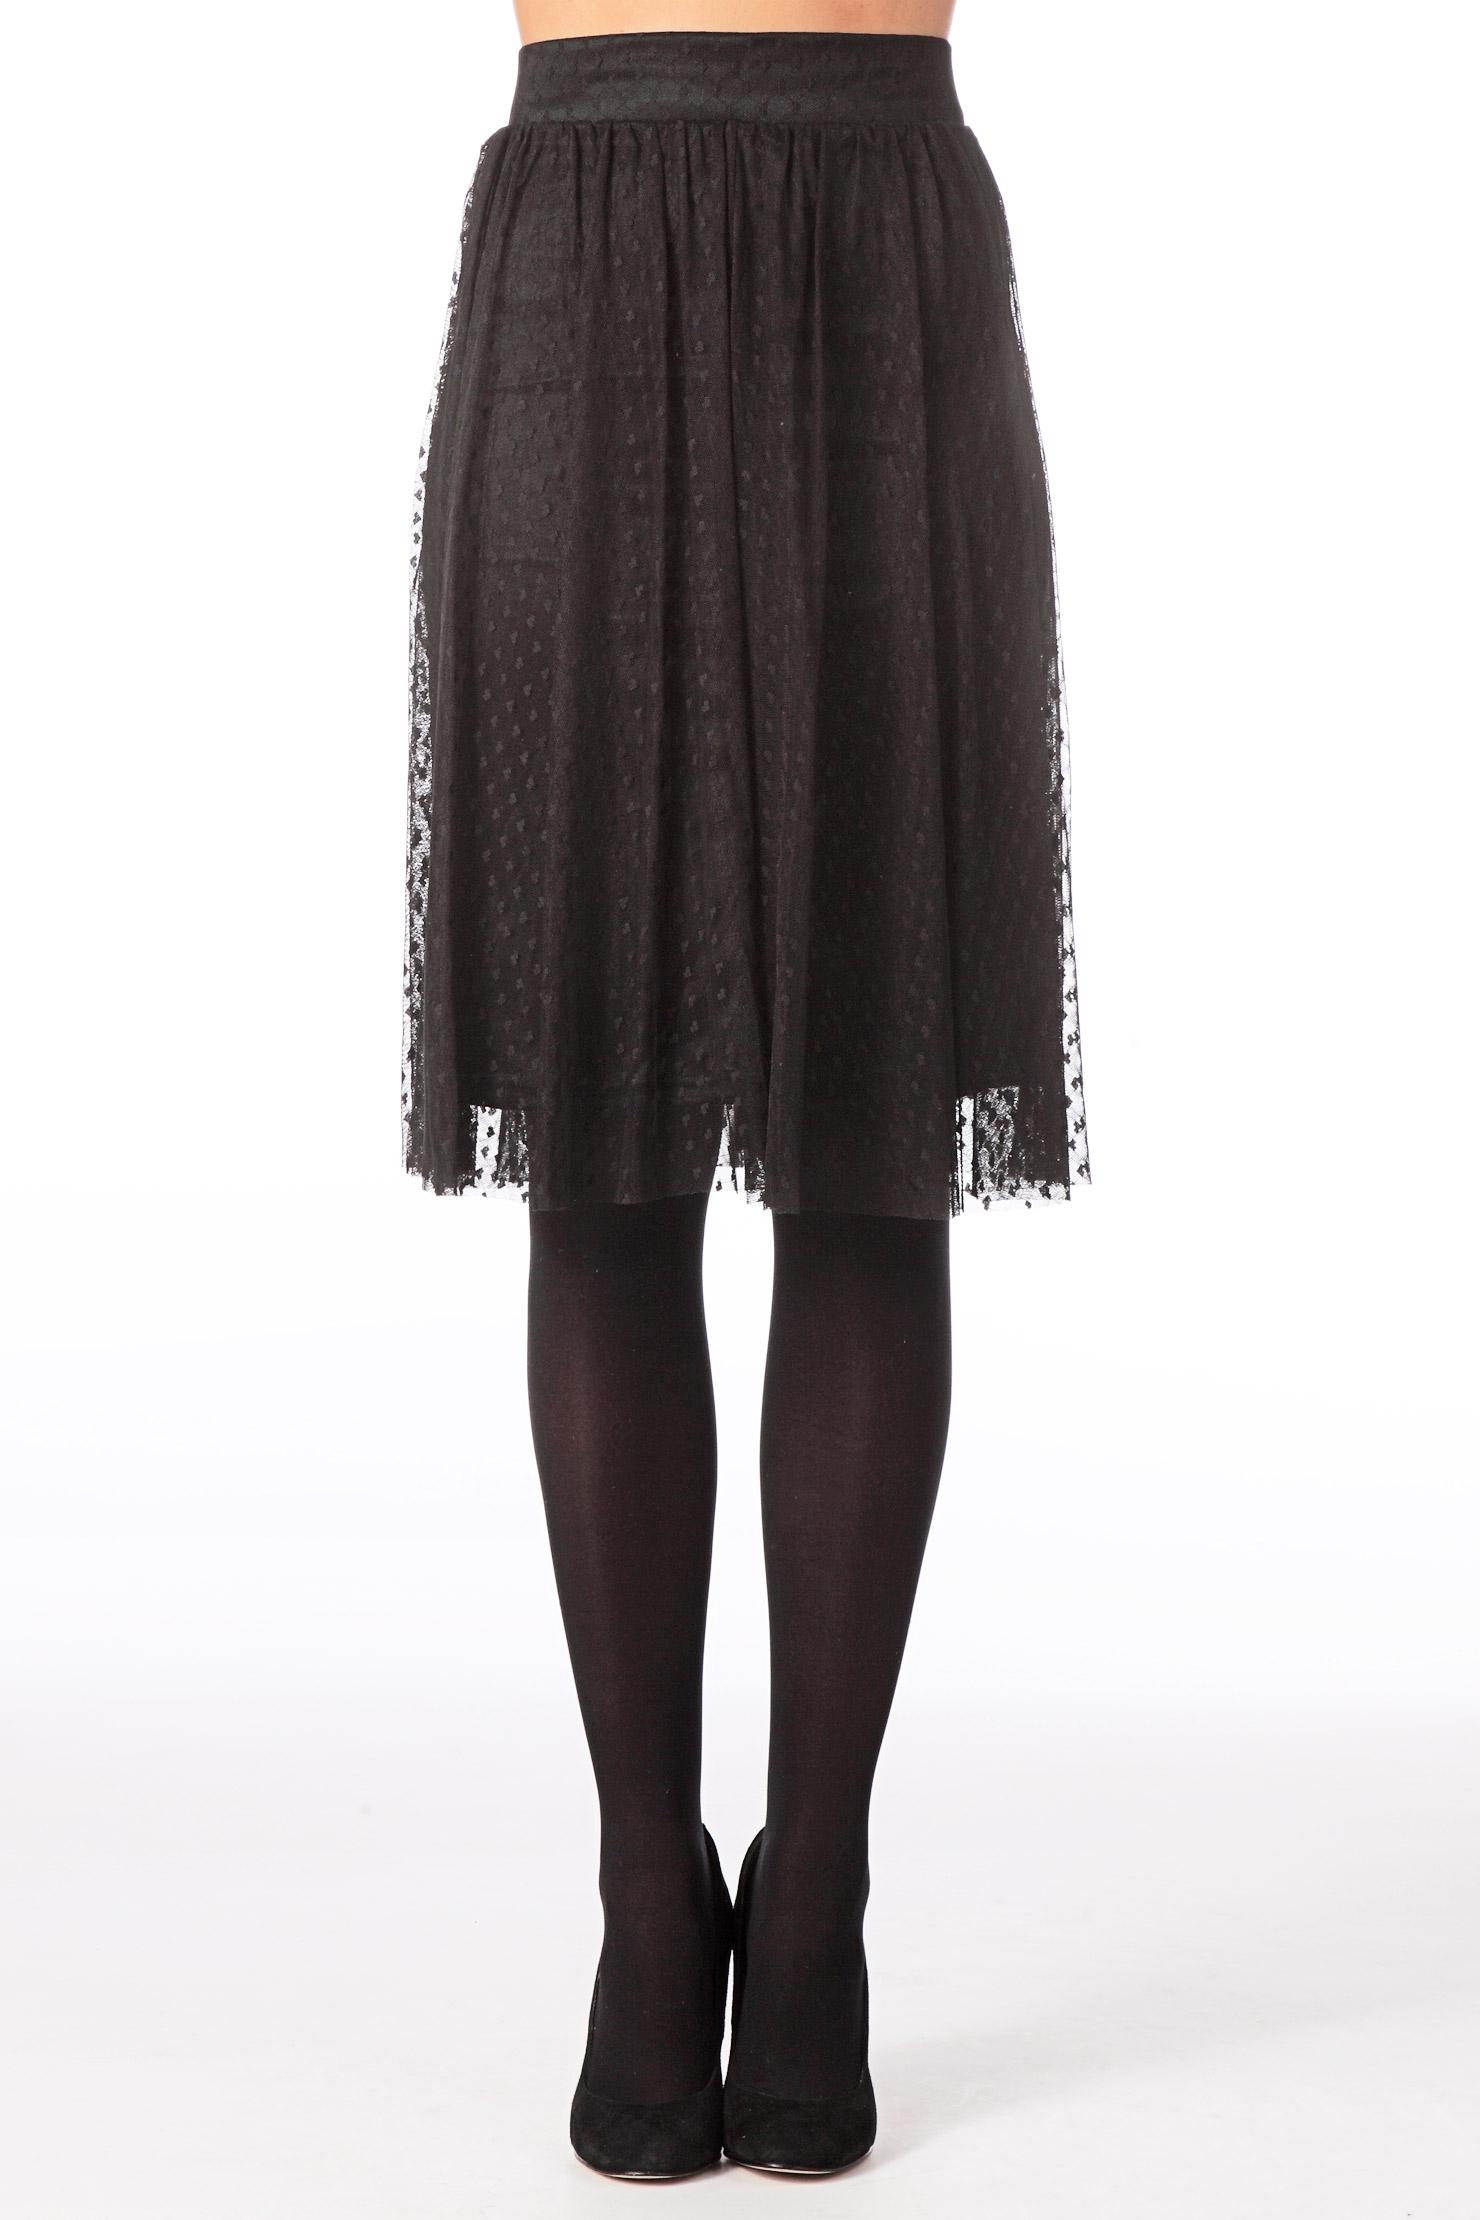 vero moda black midi skirt maxi skirt lyst